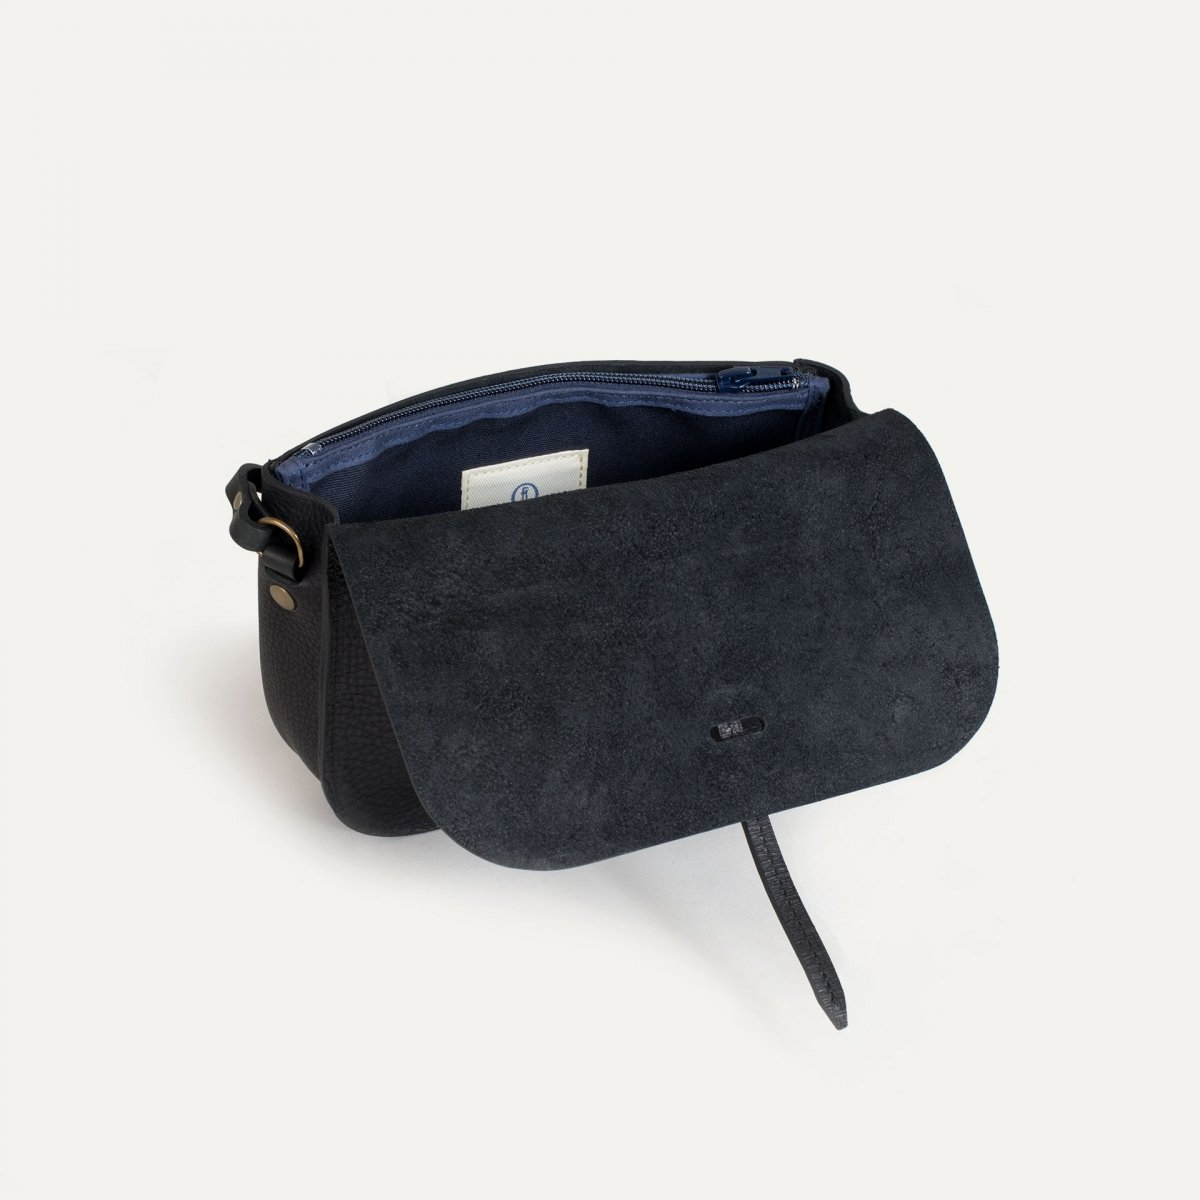 Pastis handbag - Black (image n°4)